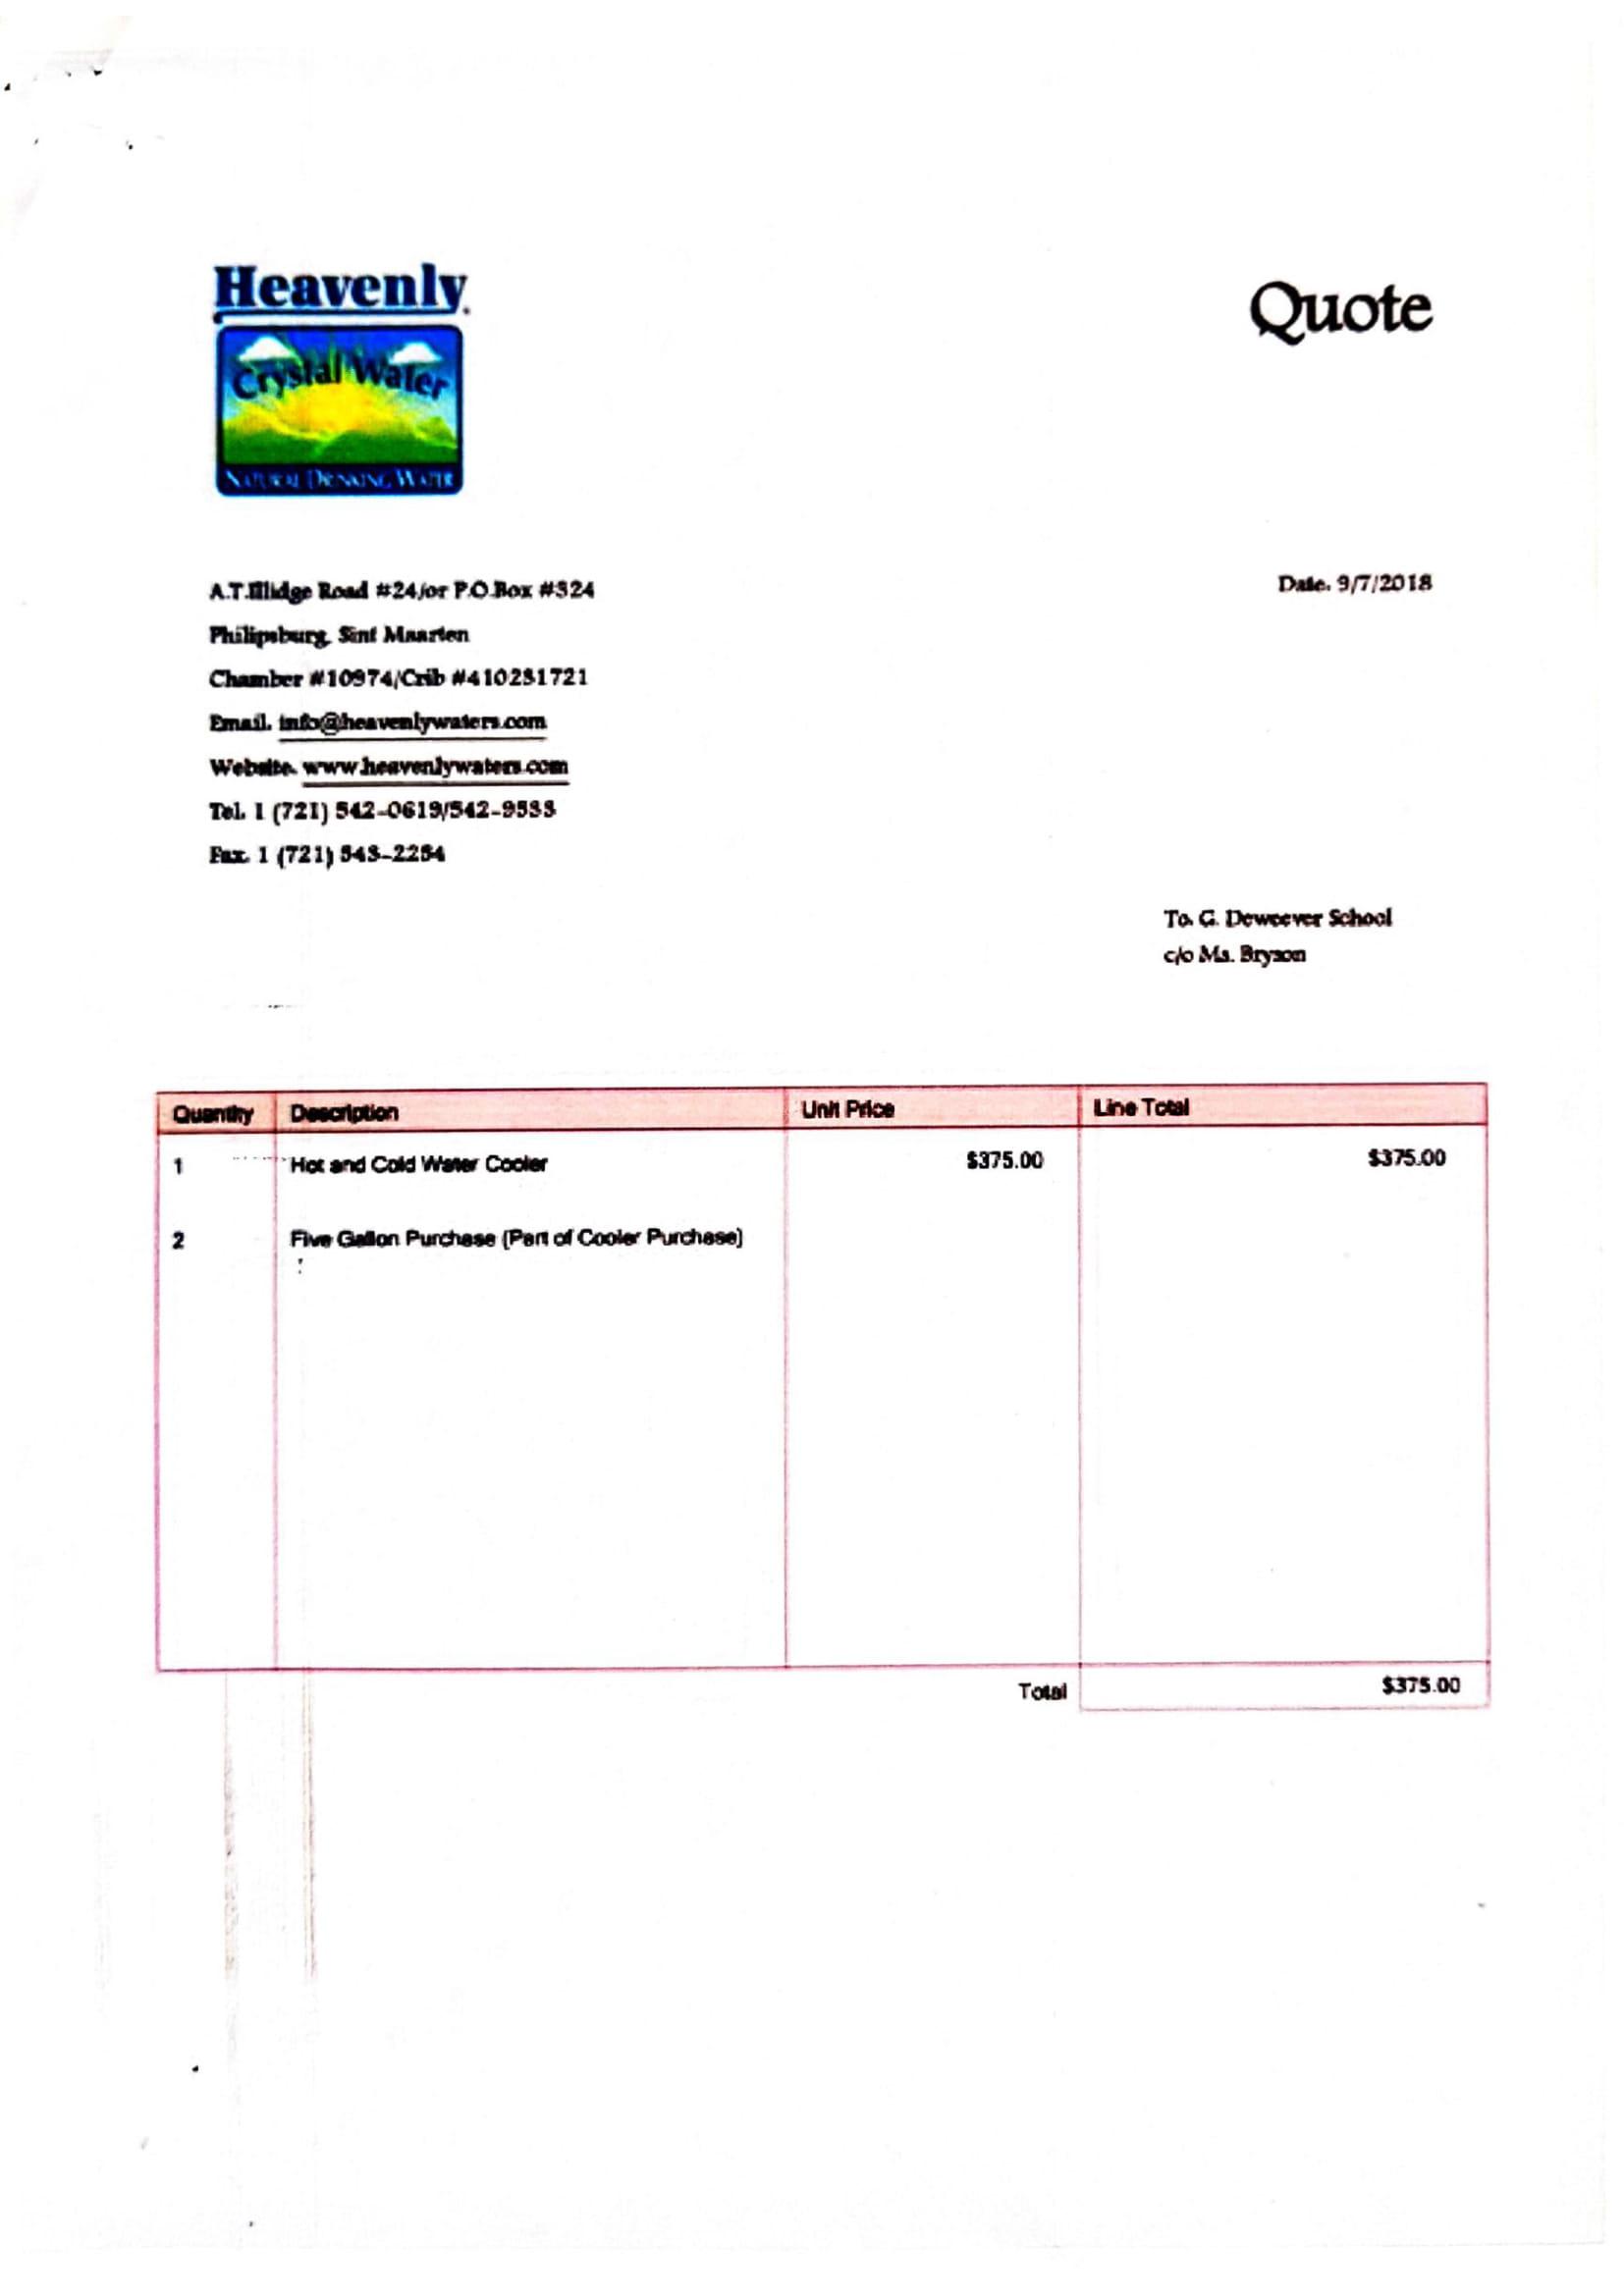 Payement To Heavenly Water for Marie Geneviève deweever school-3.jpg